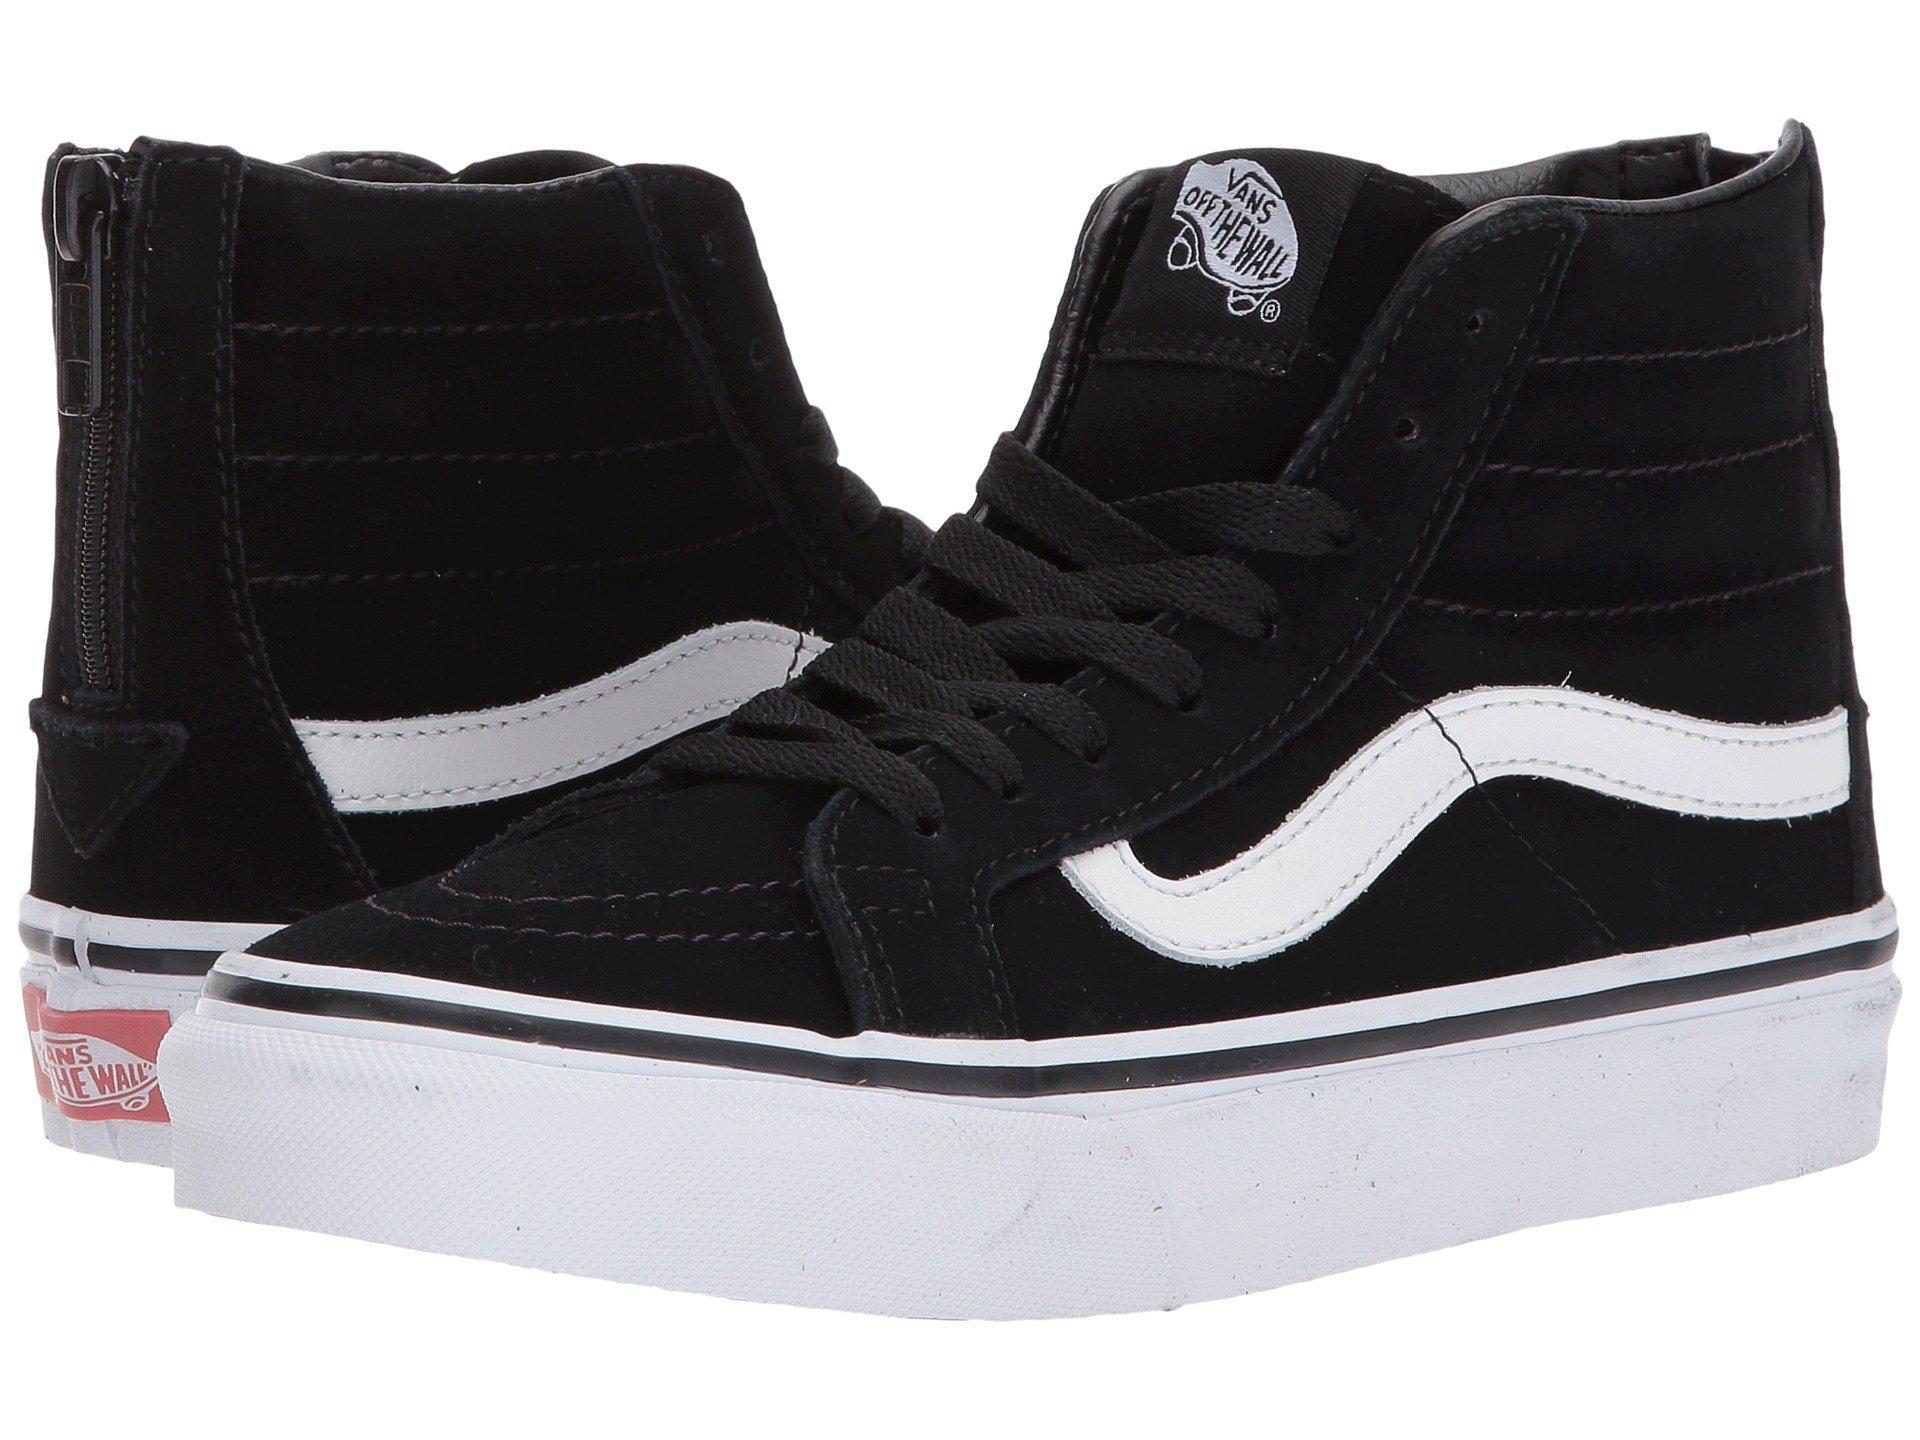 f6f9e1a6f5 Lyst - Vans Sk8-hi Slim Zip ((winter Bloom) Black white) Skate Shoes ...